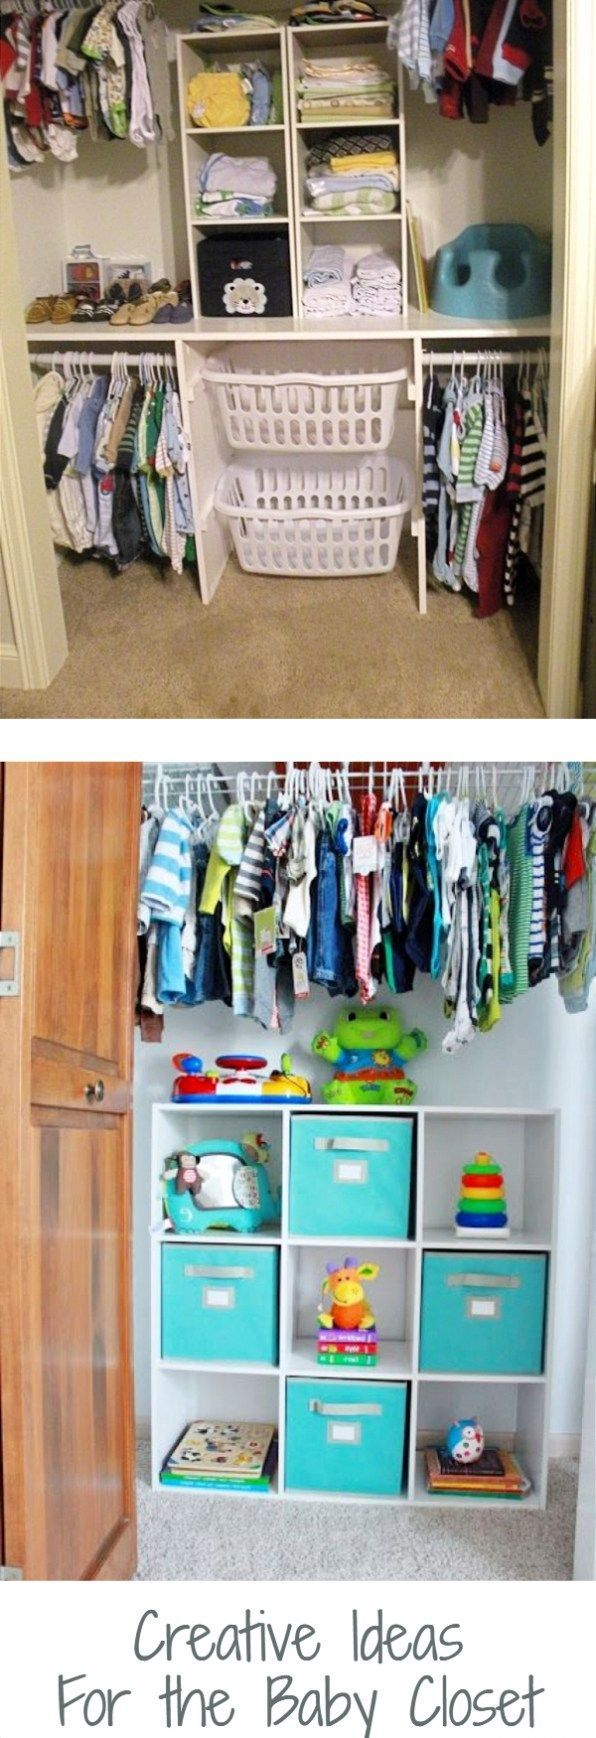 37 Baby Closet Organization Ideas Nursery Closet Organization Ideas We Love Nursery Closet Organization Baby Room Closet Bedroom Organization Closet